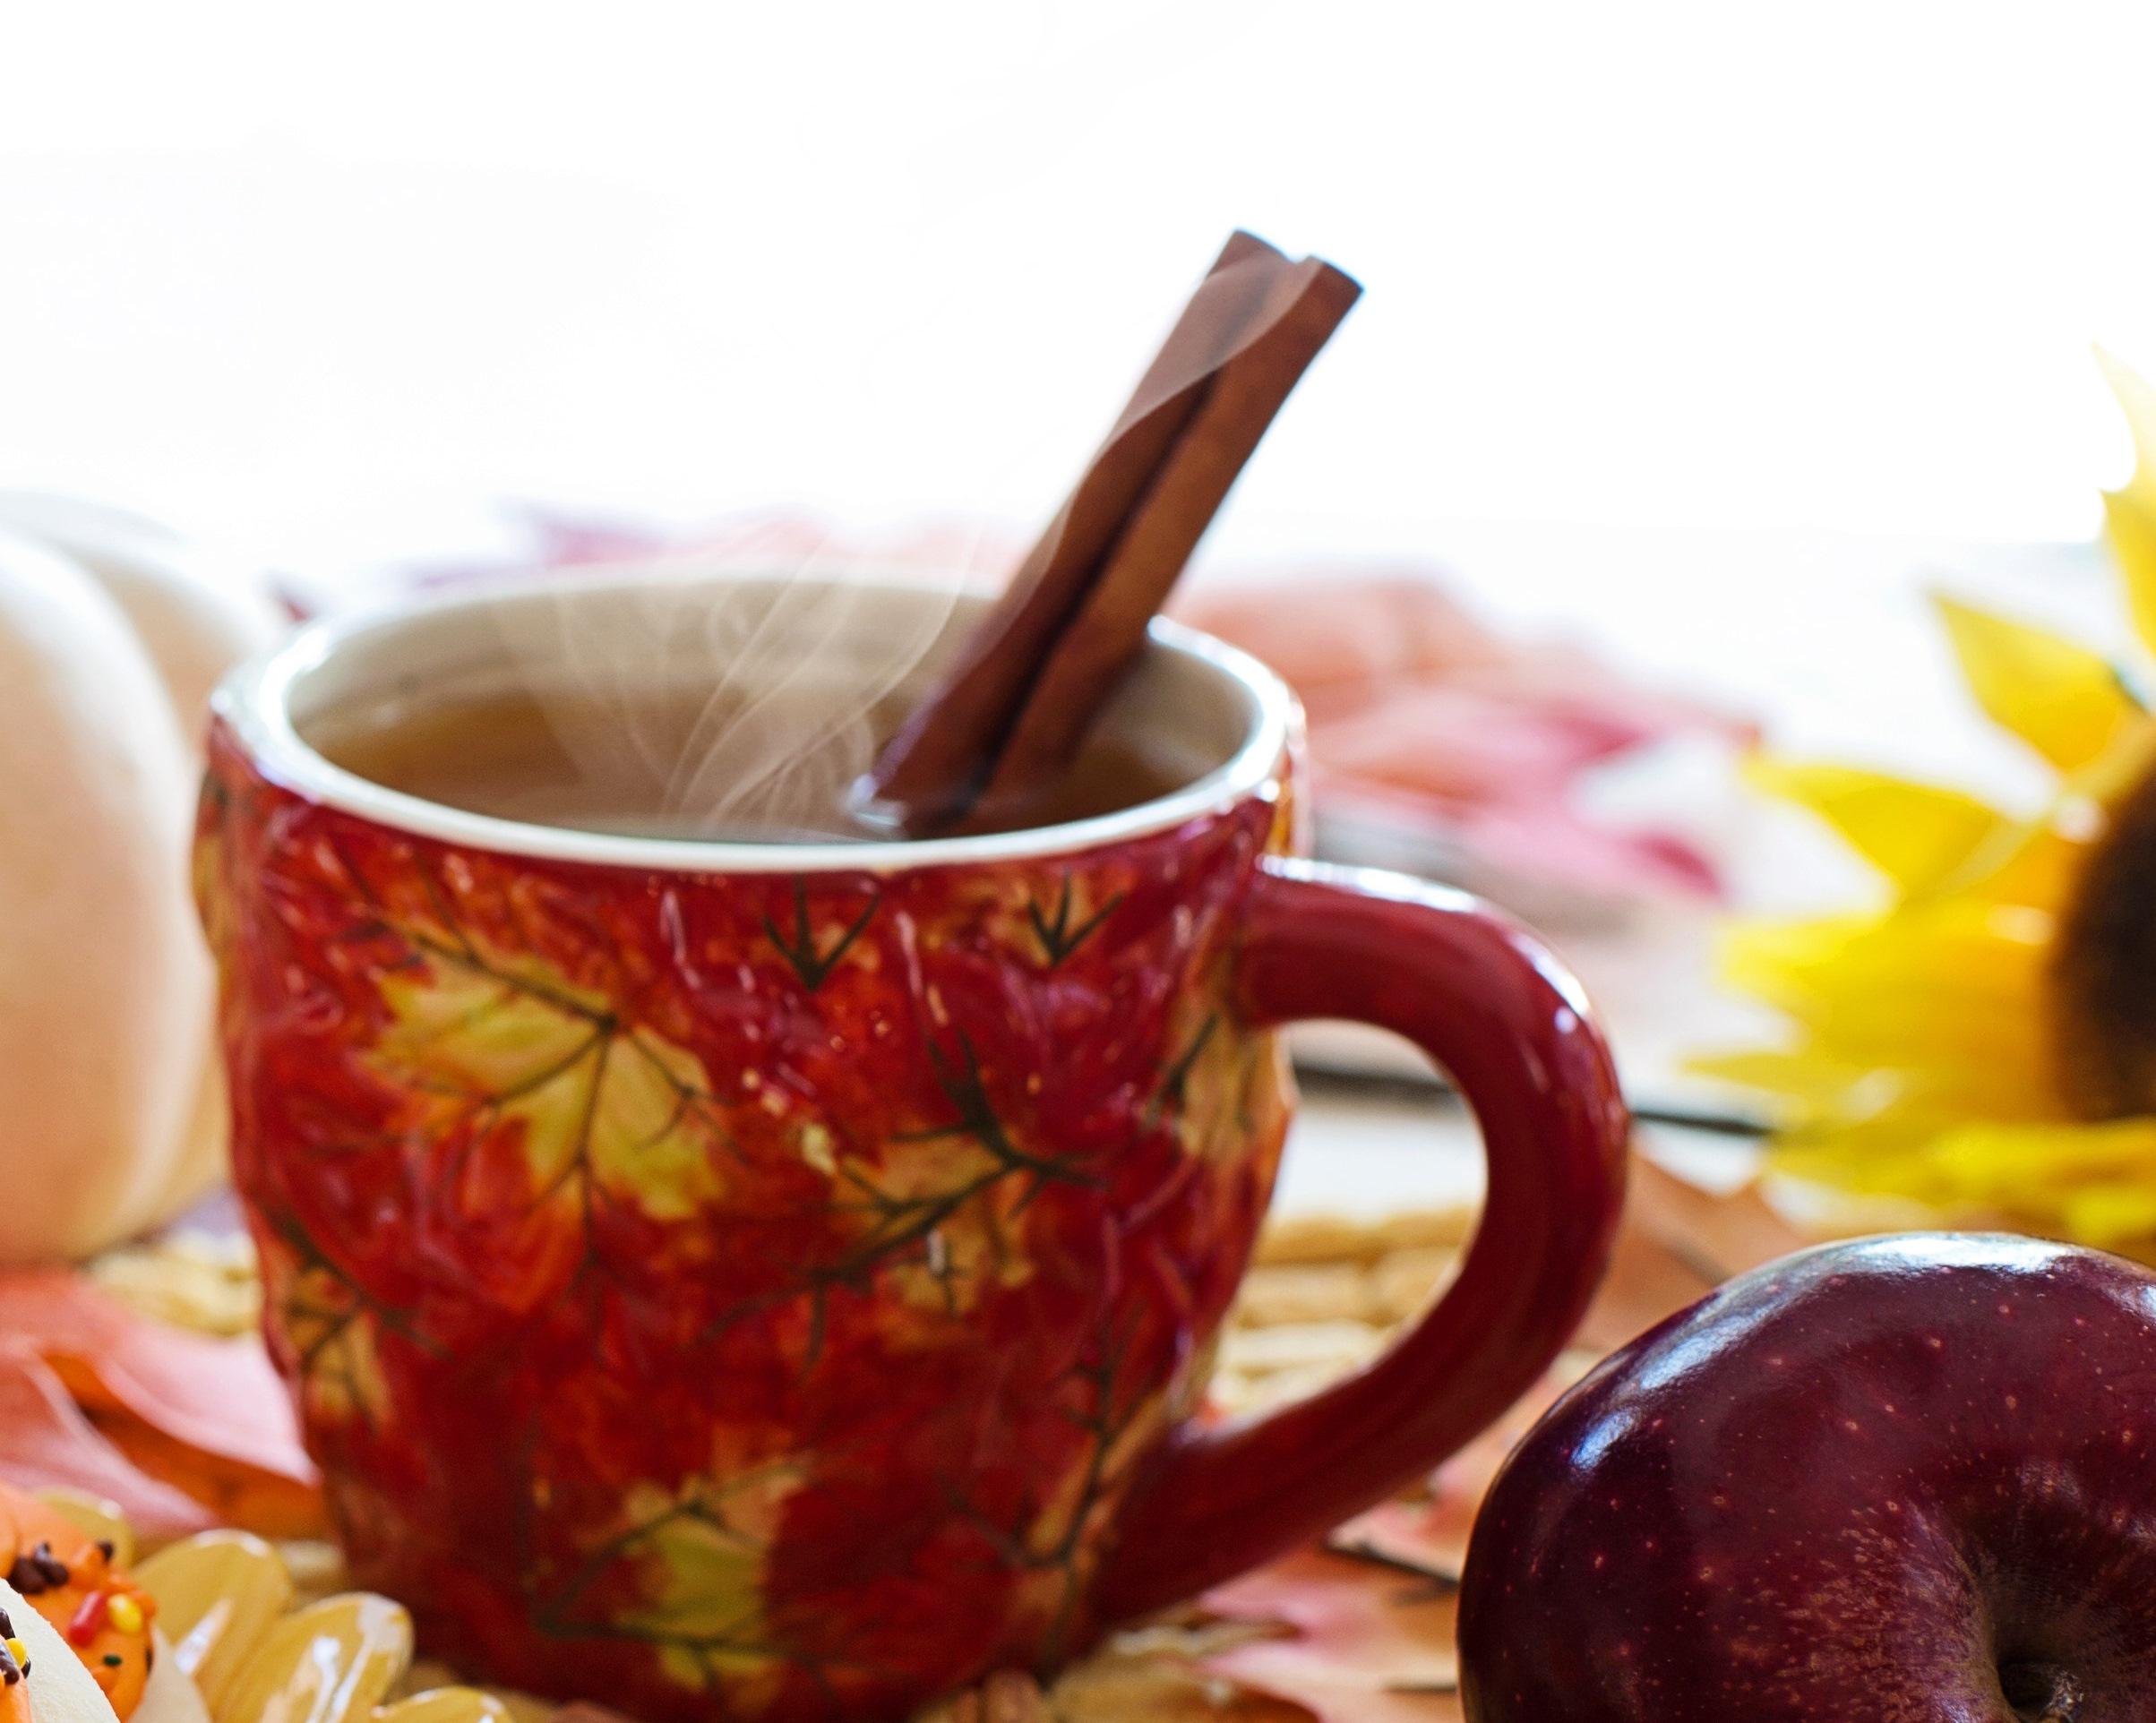 Mulled cider - cidre chaud